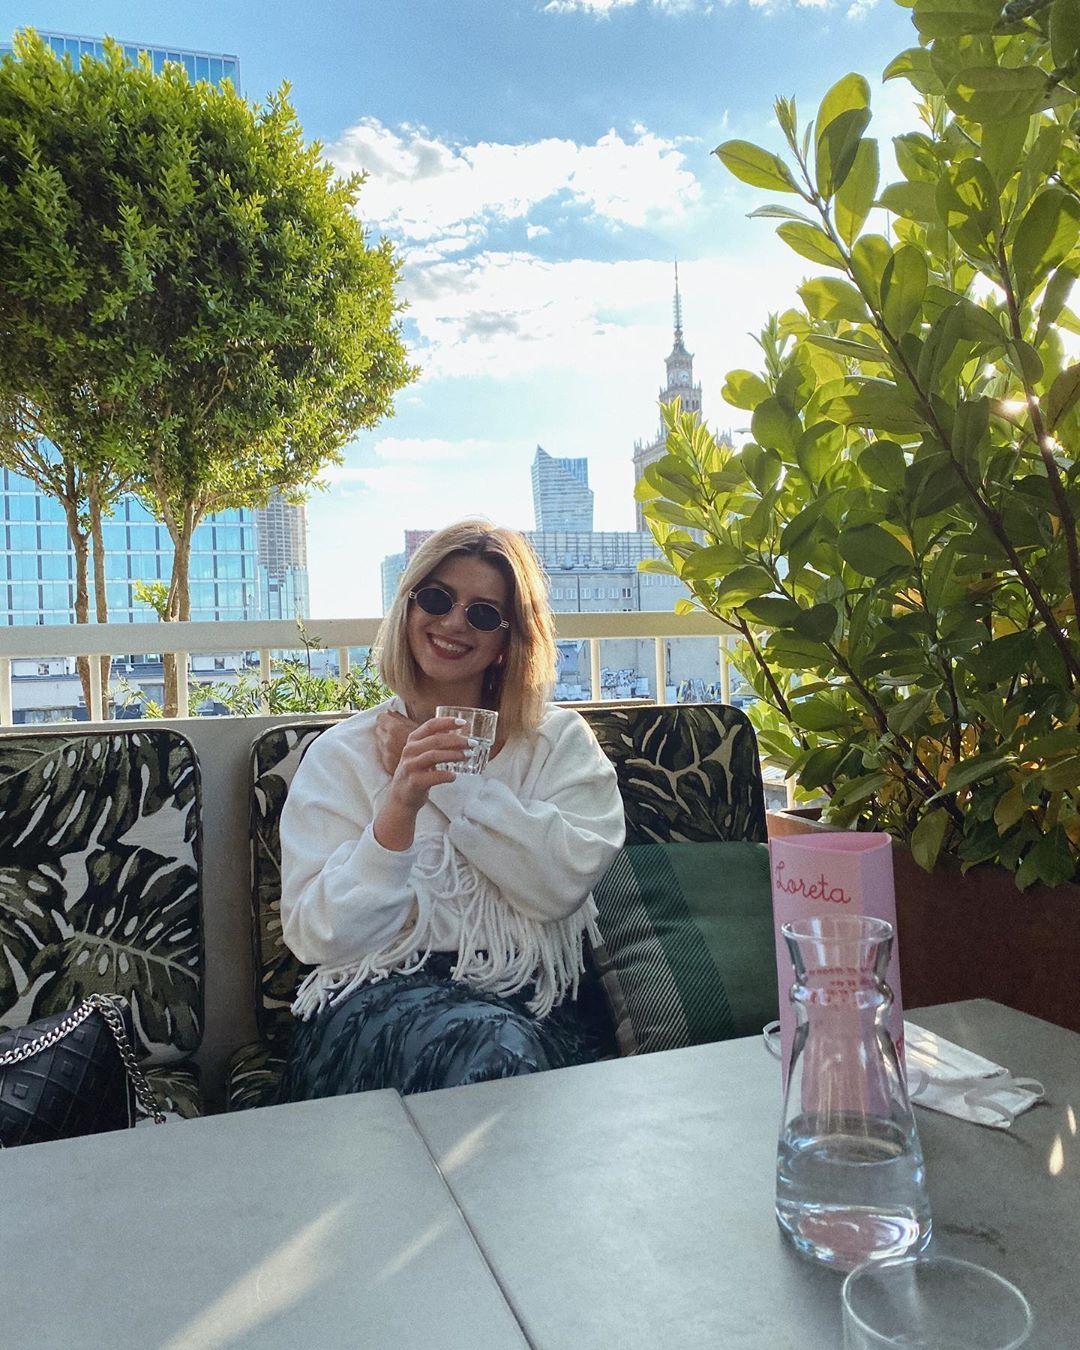 🌞 . . . .  #fashion #style #stylish #love #me #warsaw #photooftheday #happy #hair #weekend #beautiful #instagood #polishgirl #polskadziewczyna #blondehair #girl #smile #eyes #design #lato #polskadziewczyna #shoes #blondehair #styles #outfit #loretabar #sunday #summer #freetime